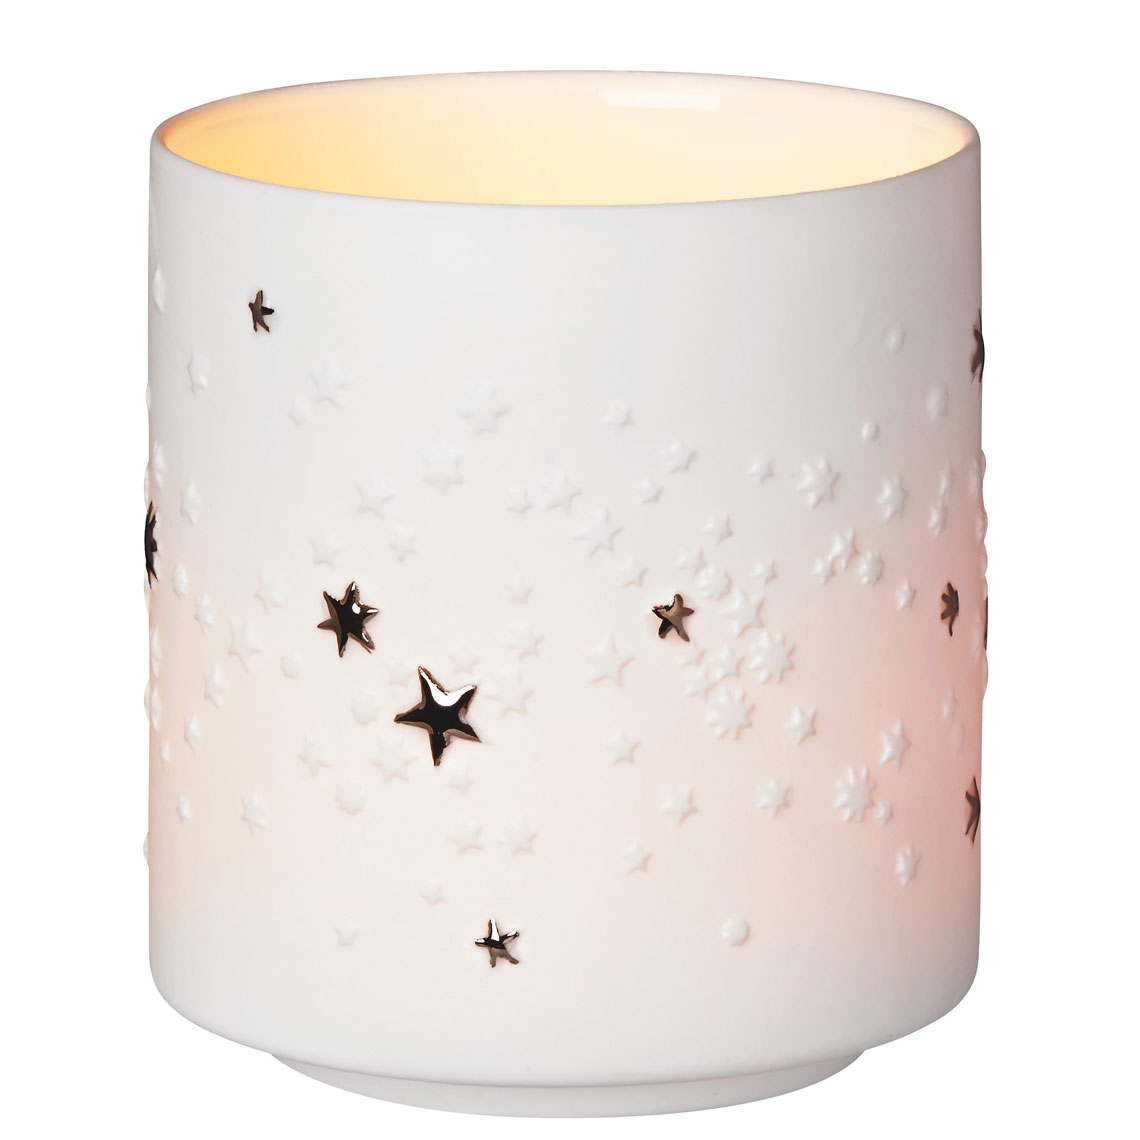 Ljuslykta Star - Räder • Pryloteket